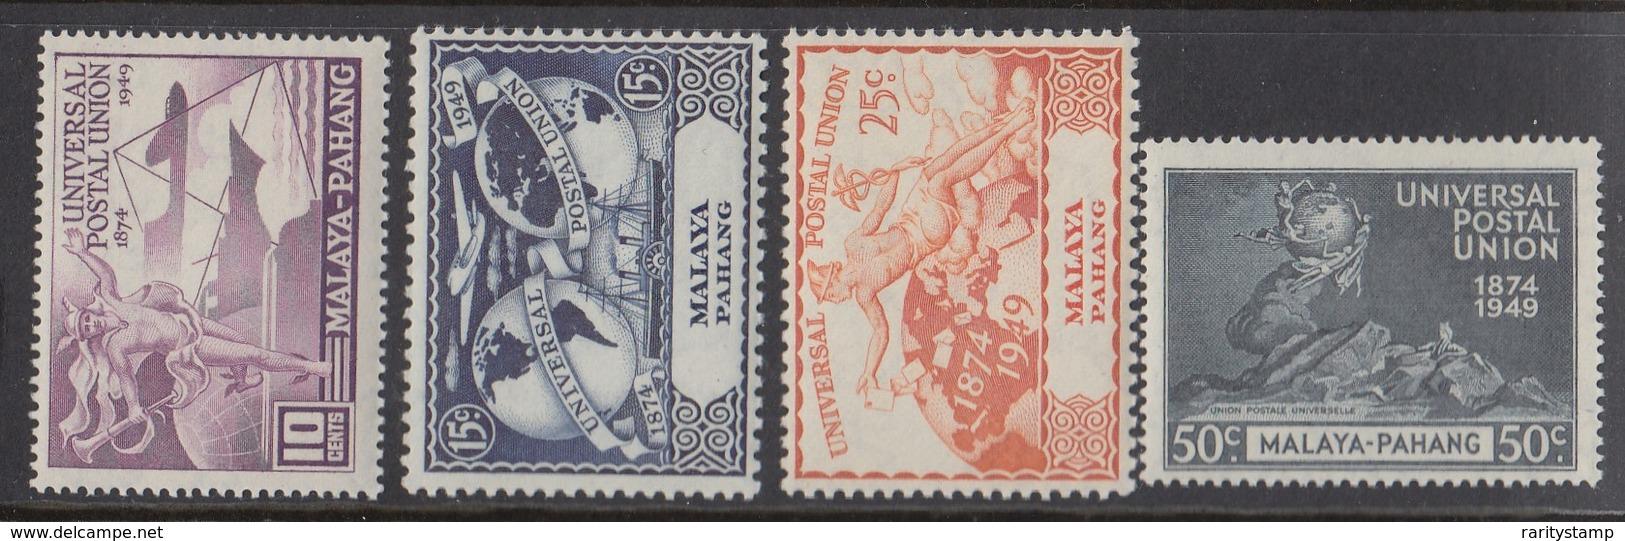 MALAYA PAHANG  1949  UPU   SET SG 49/52 MNH - Perlis